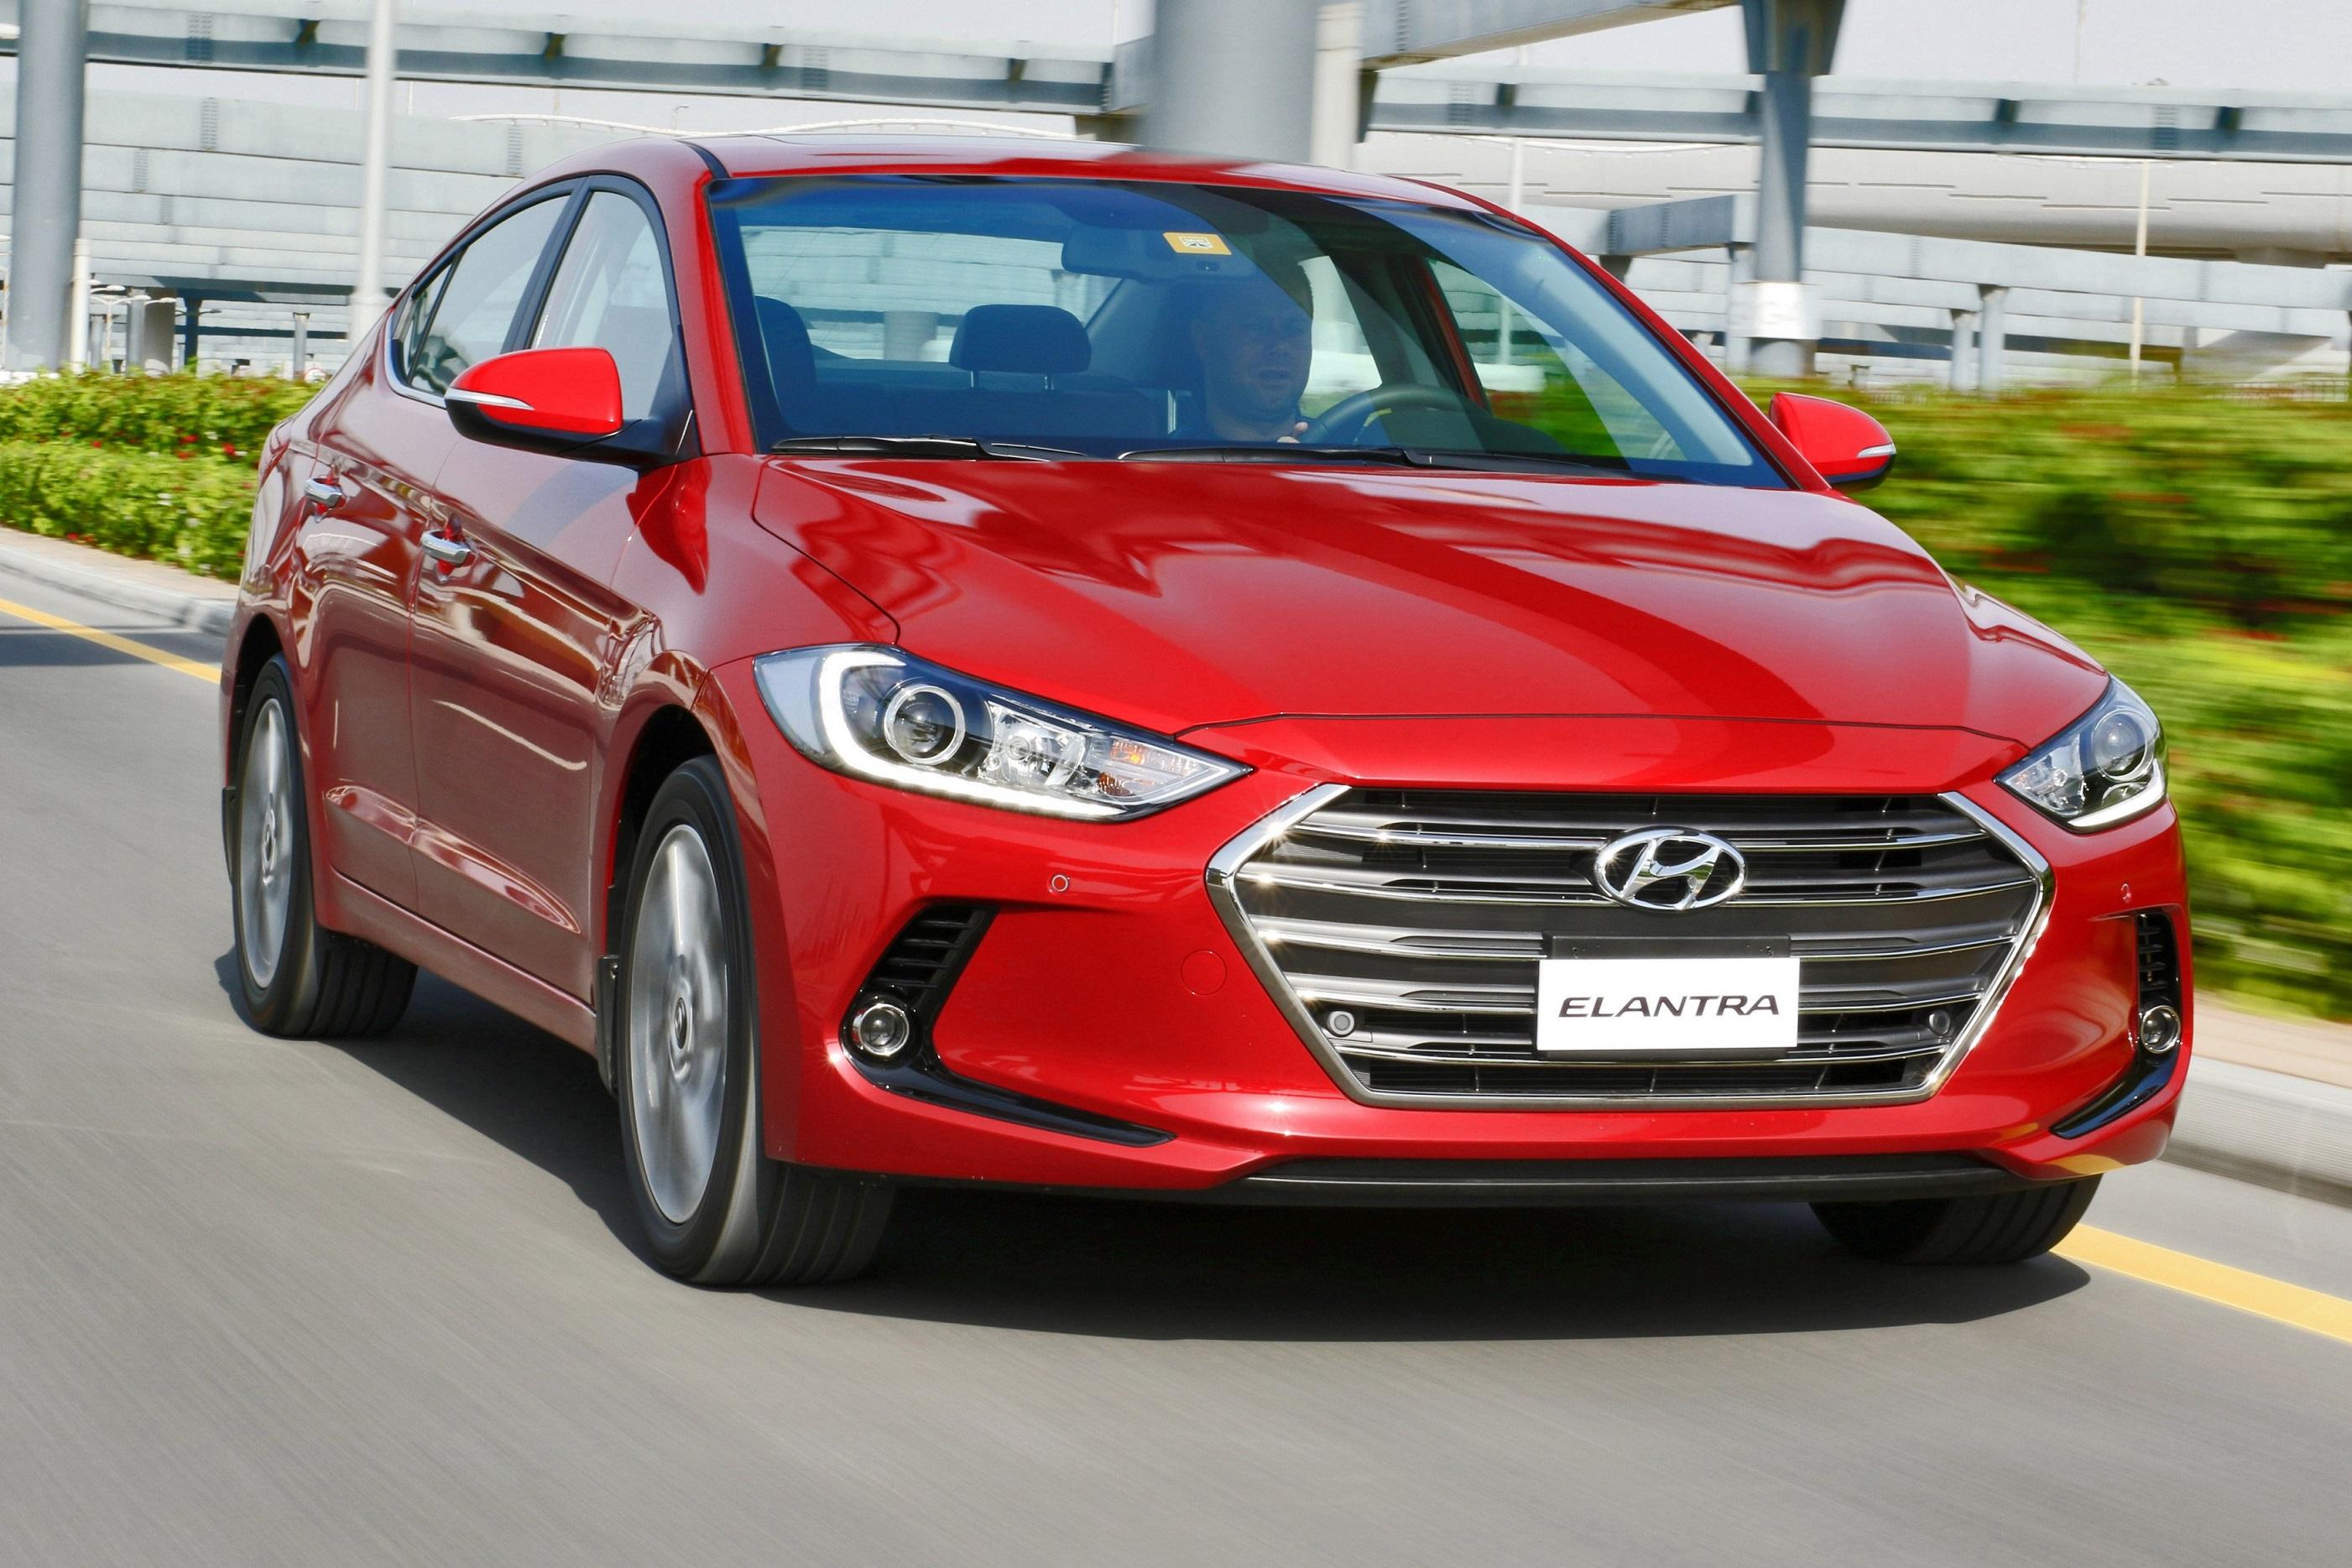 Hyundai All-new Elantra Front Red